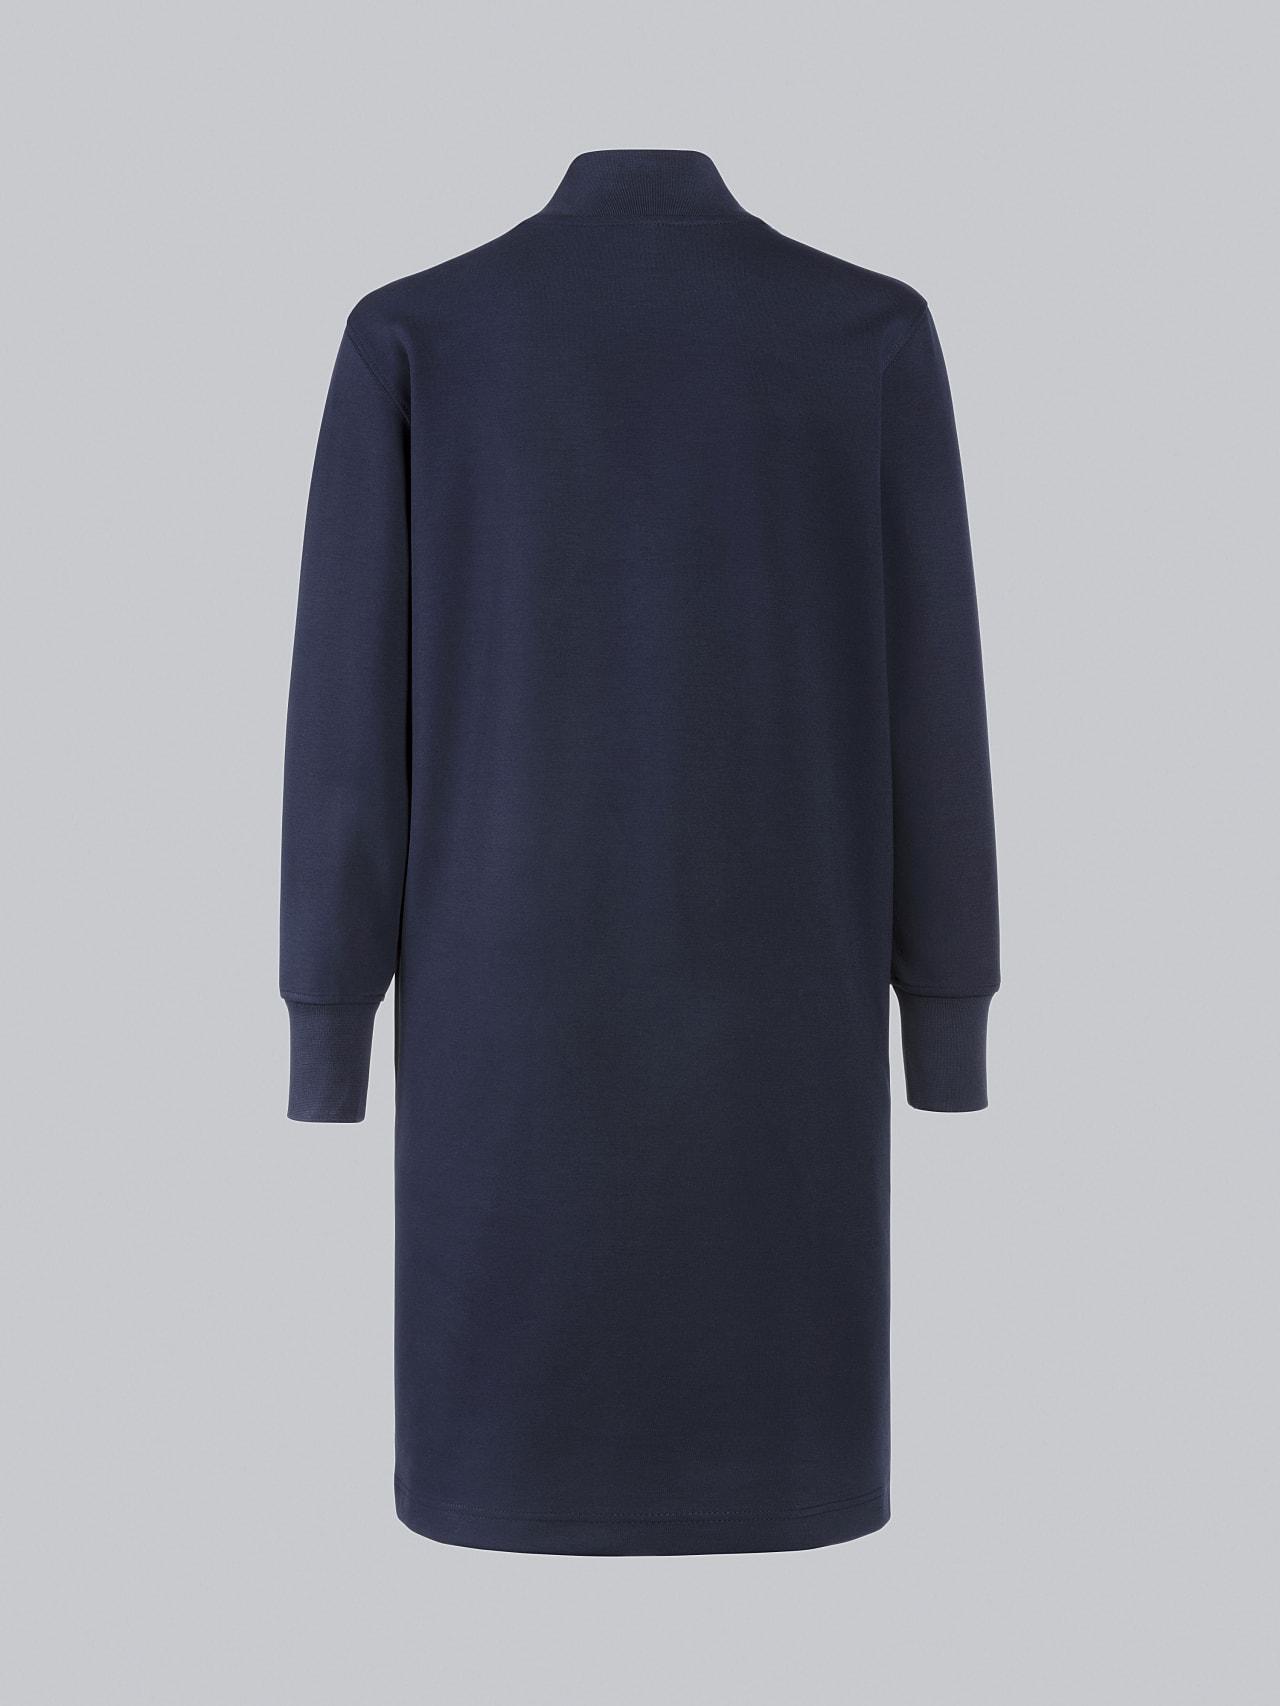 STAR V3.Y5.02 Premium Logo Sweater Dress navy Left Alpha Tauri